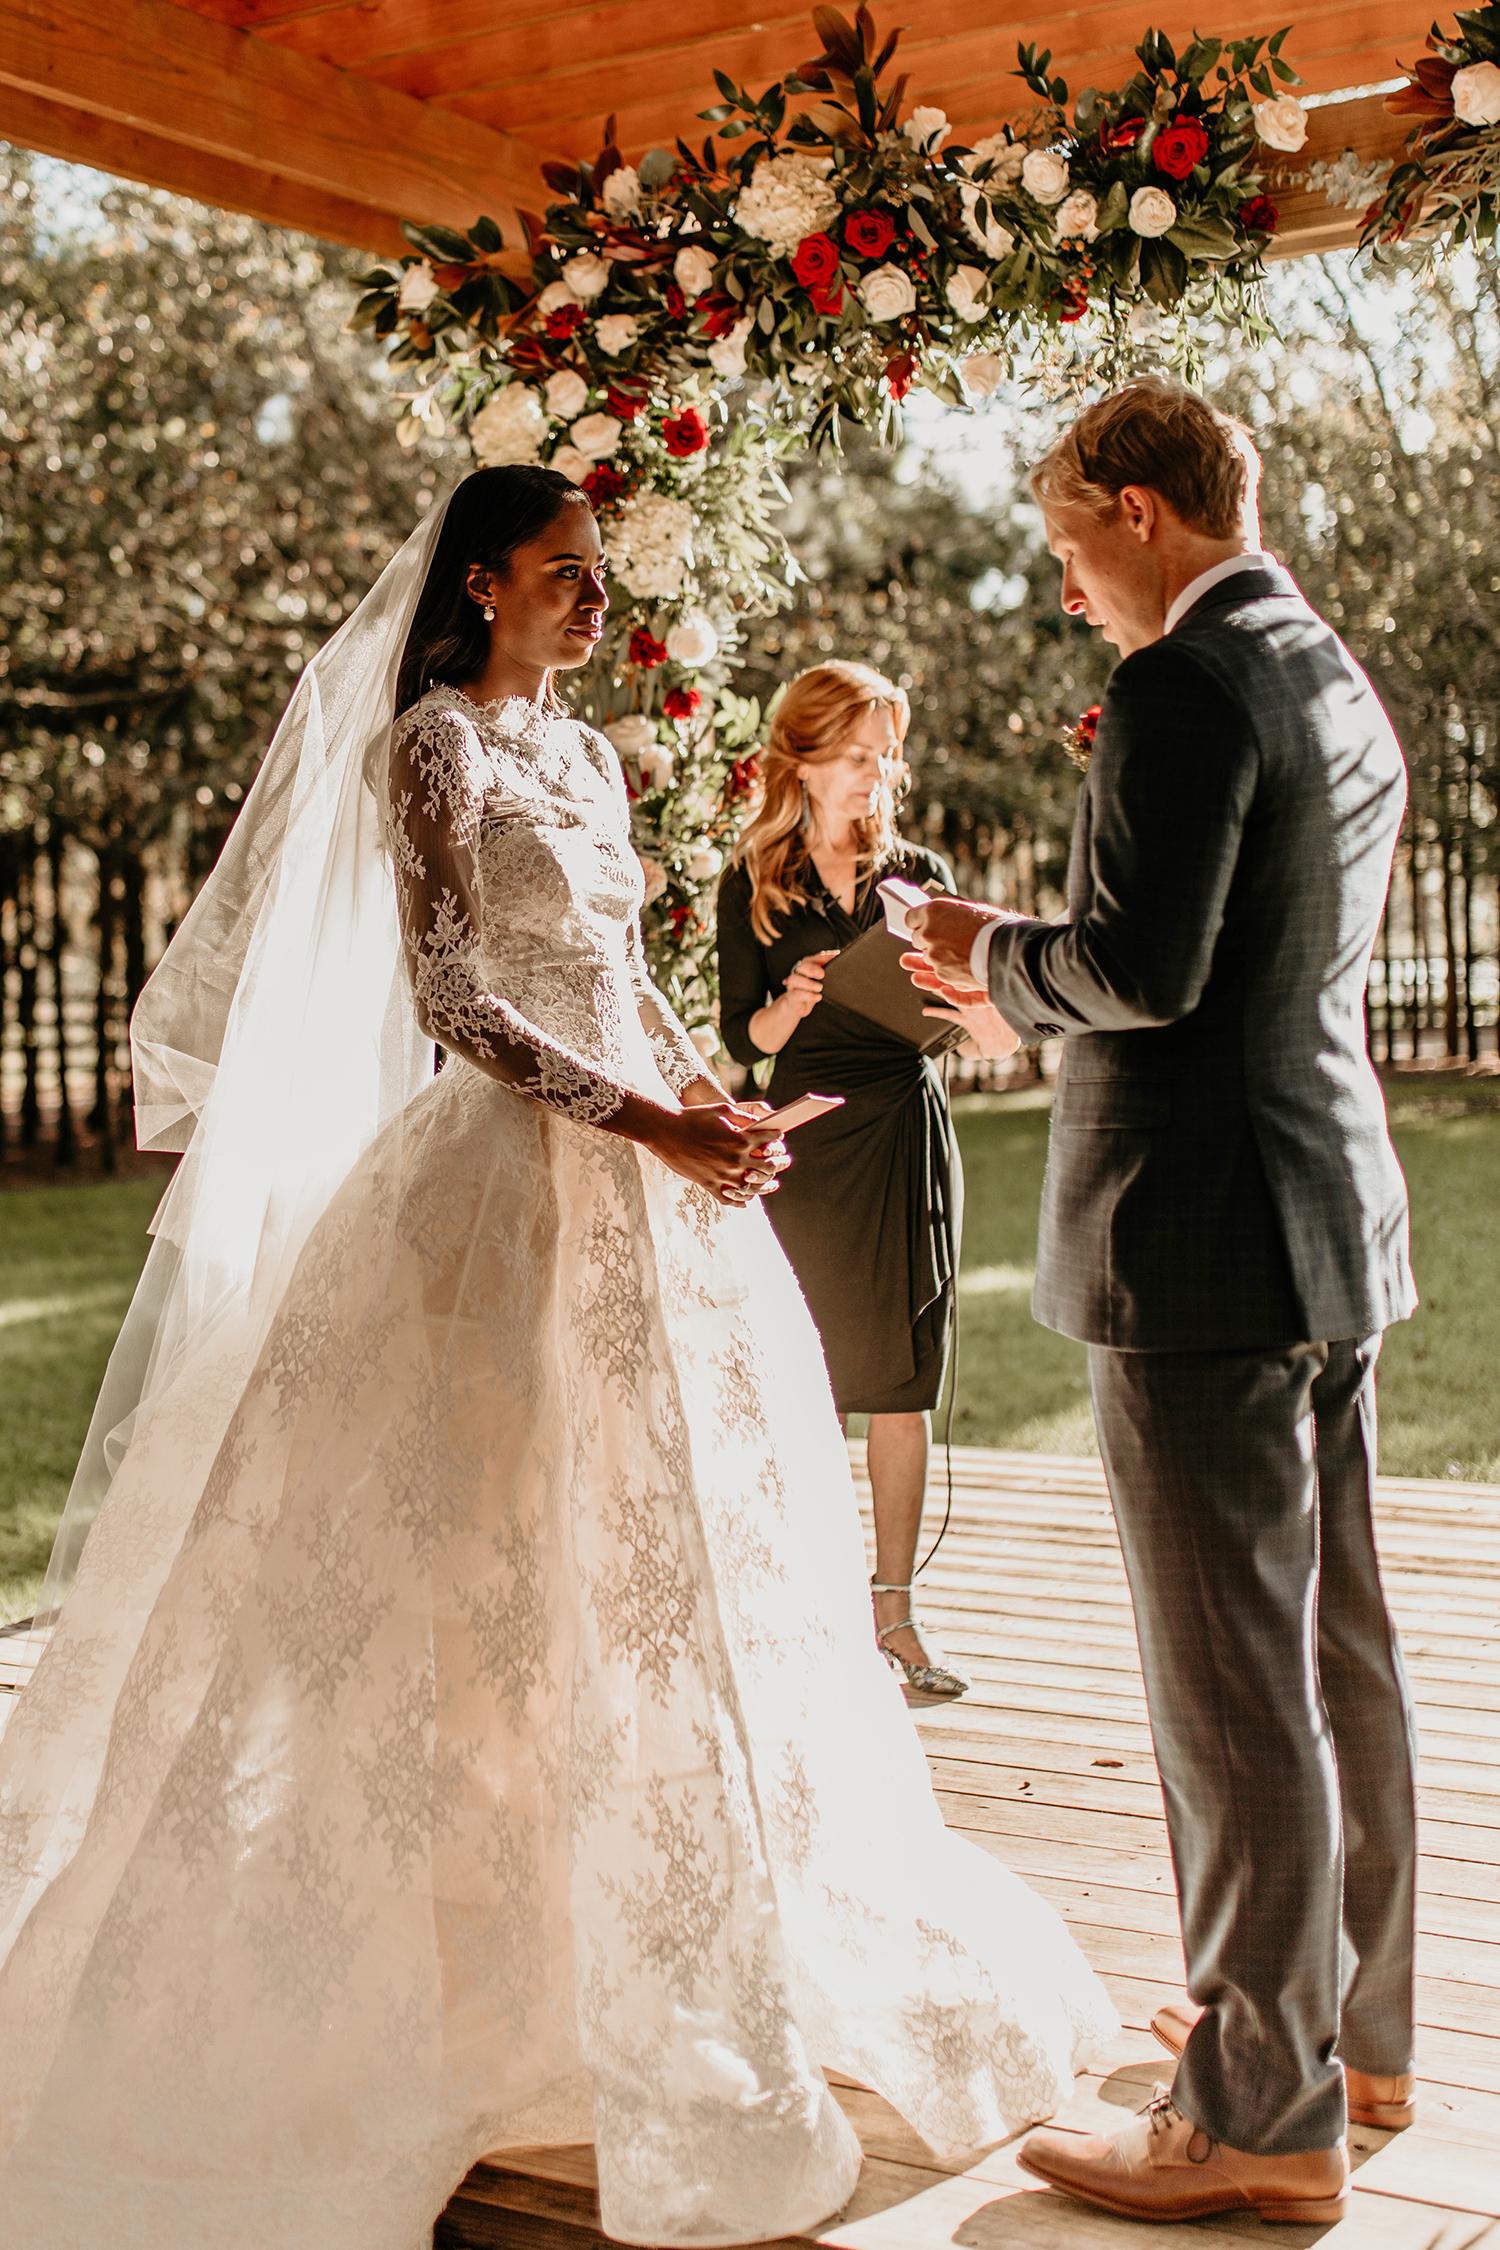 aerielle dyan wedding couple vows